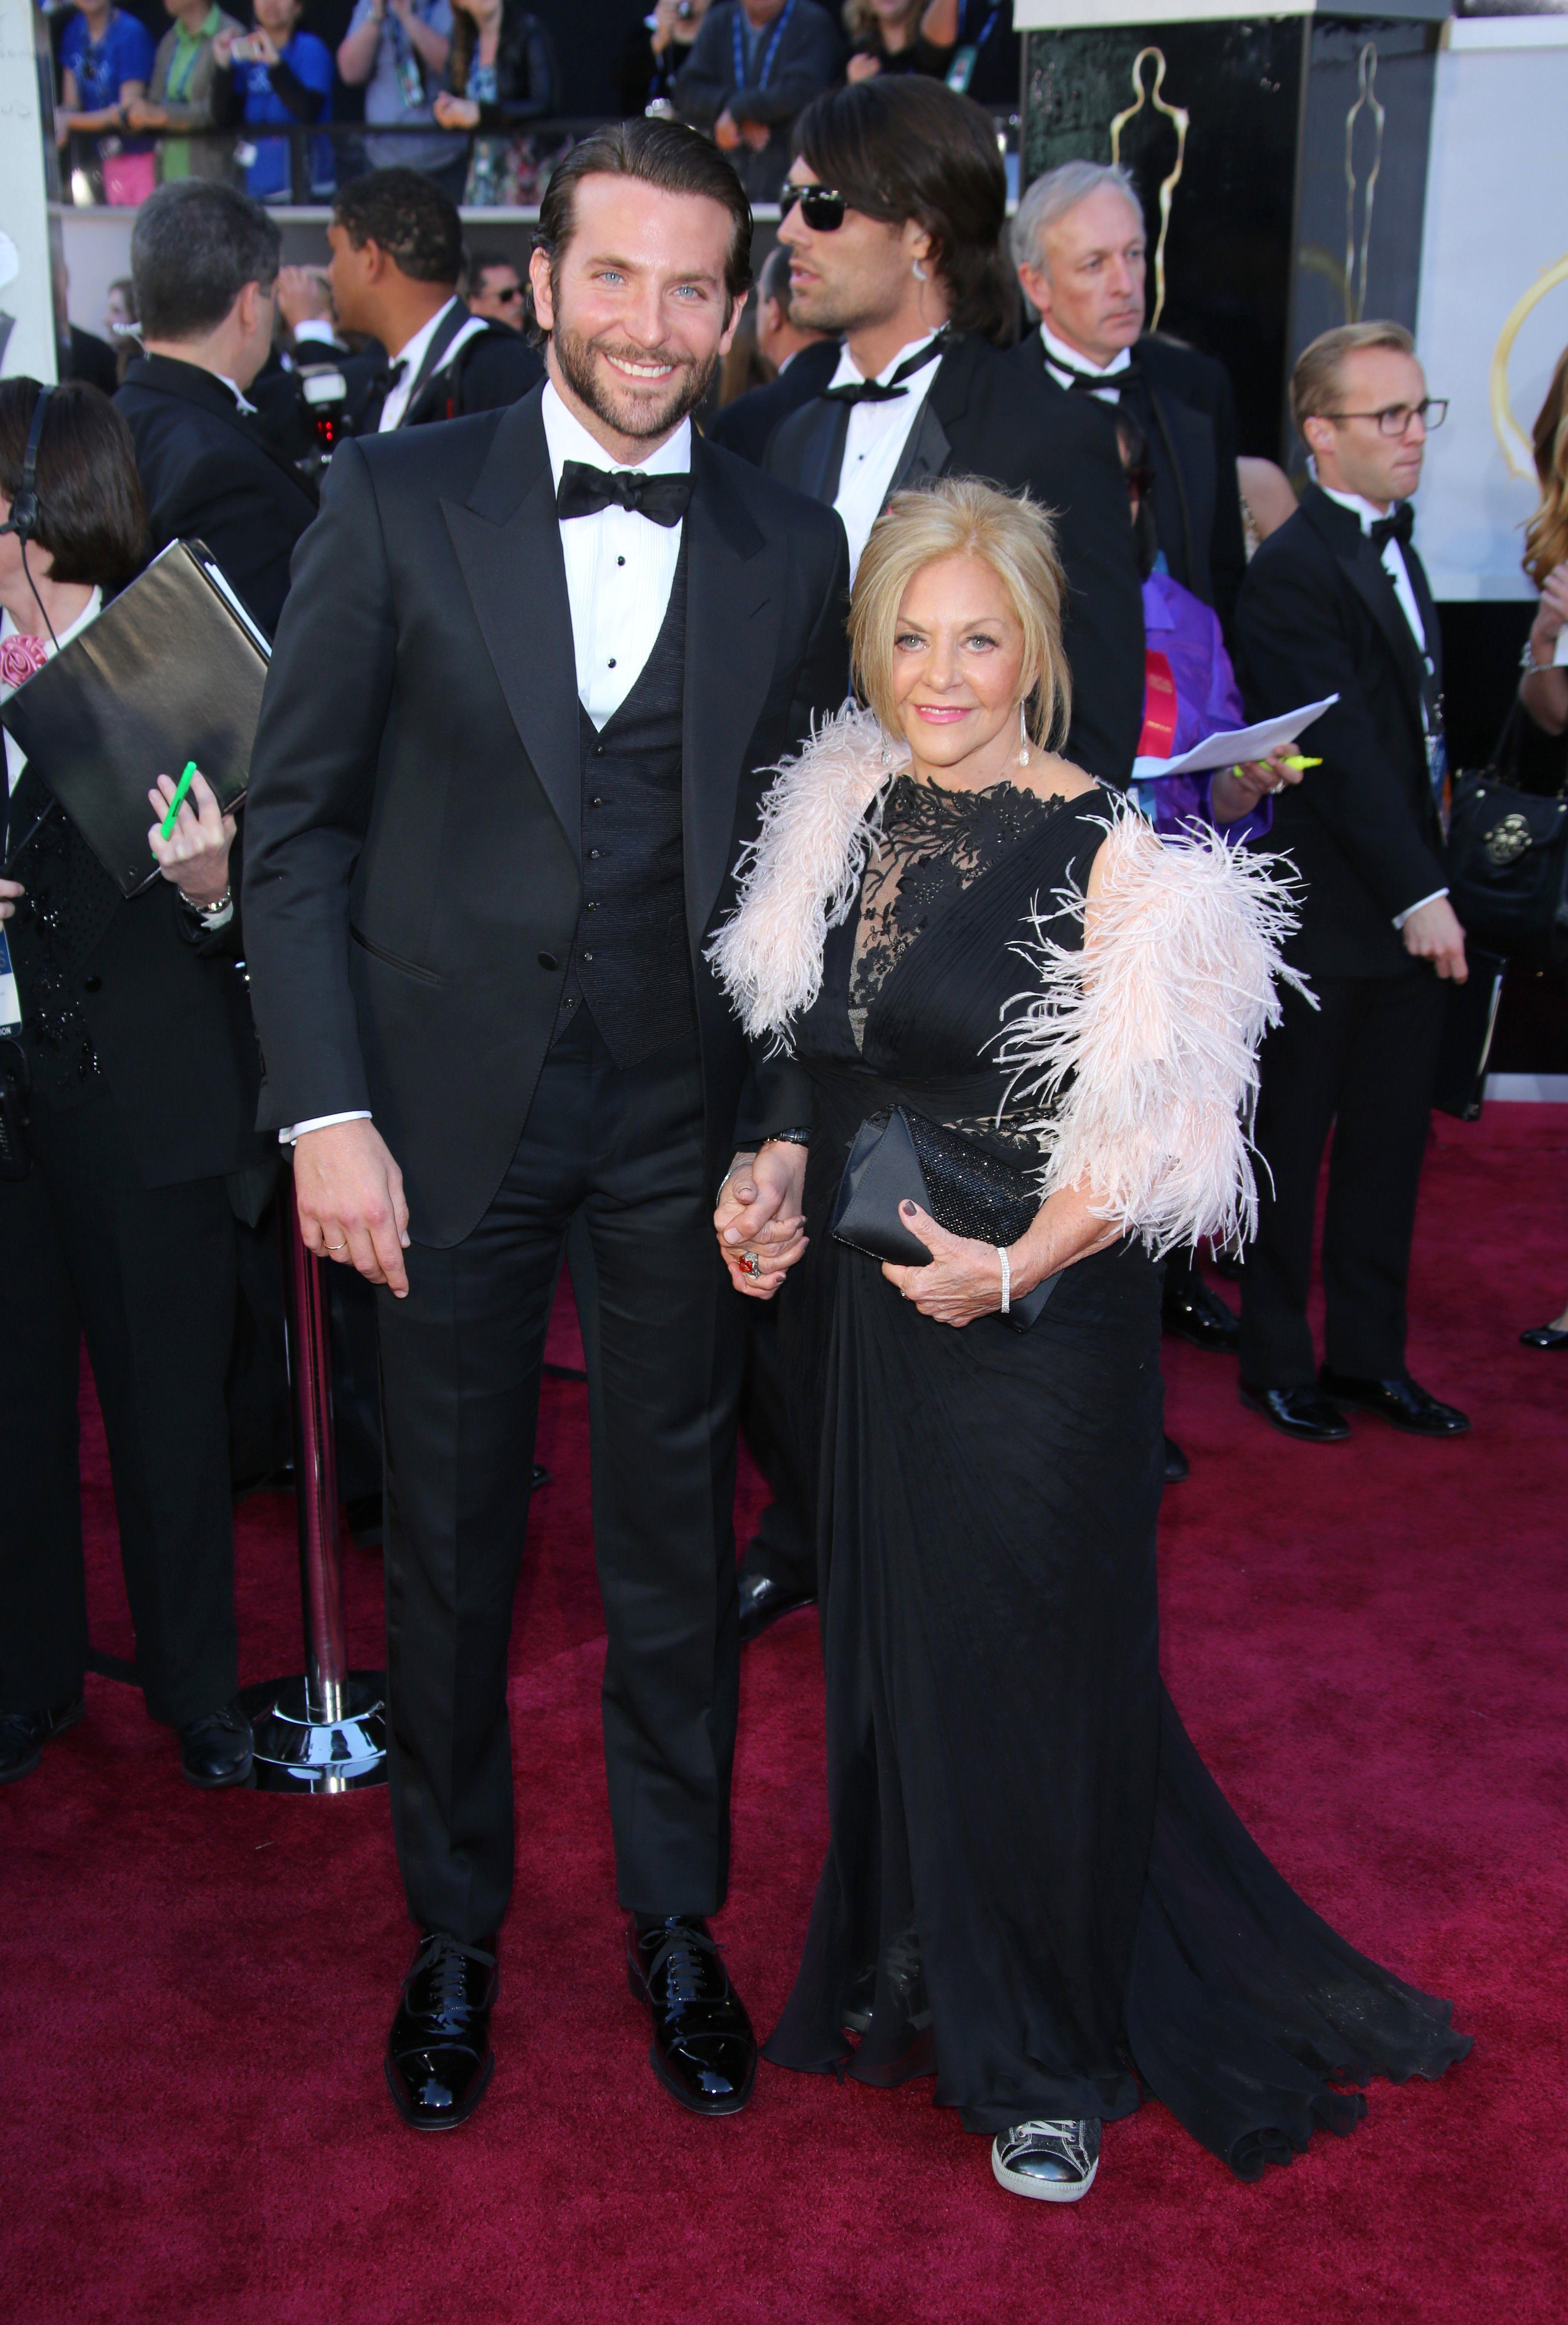 bradley cooper and mom